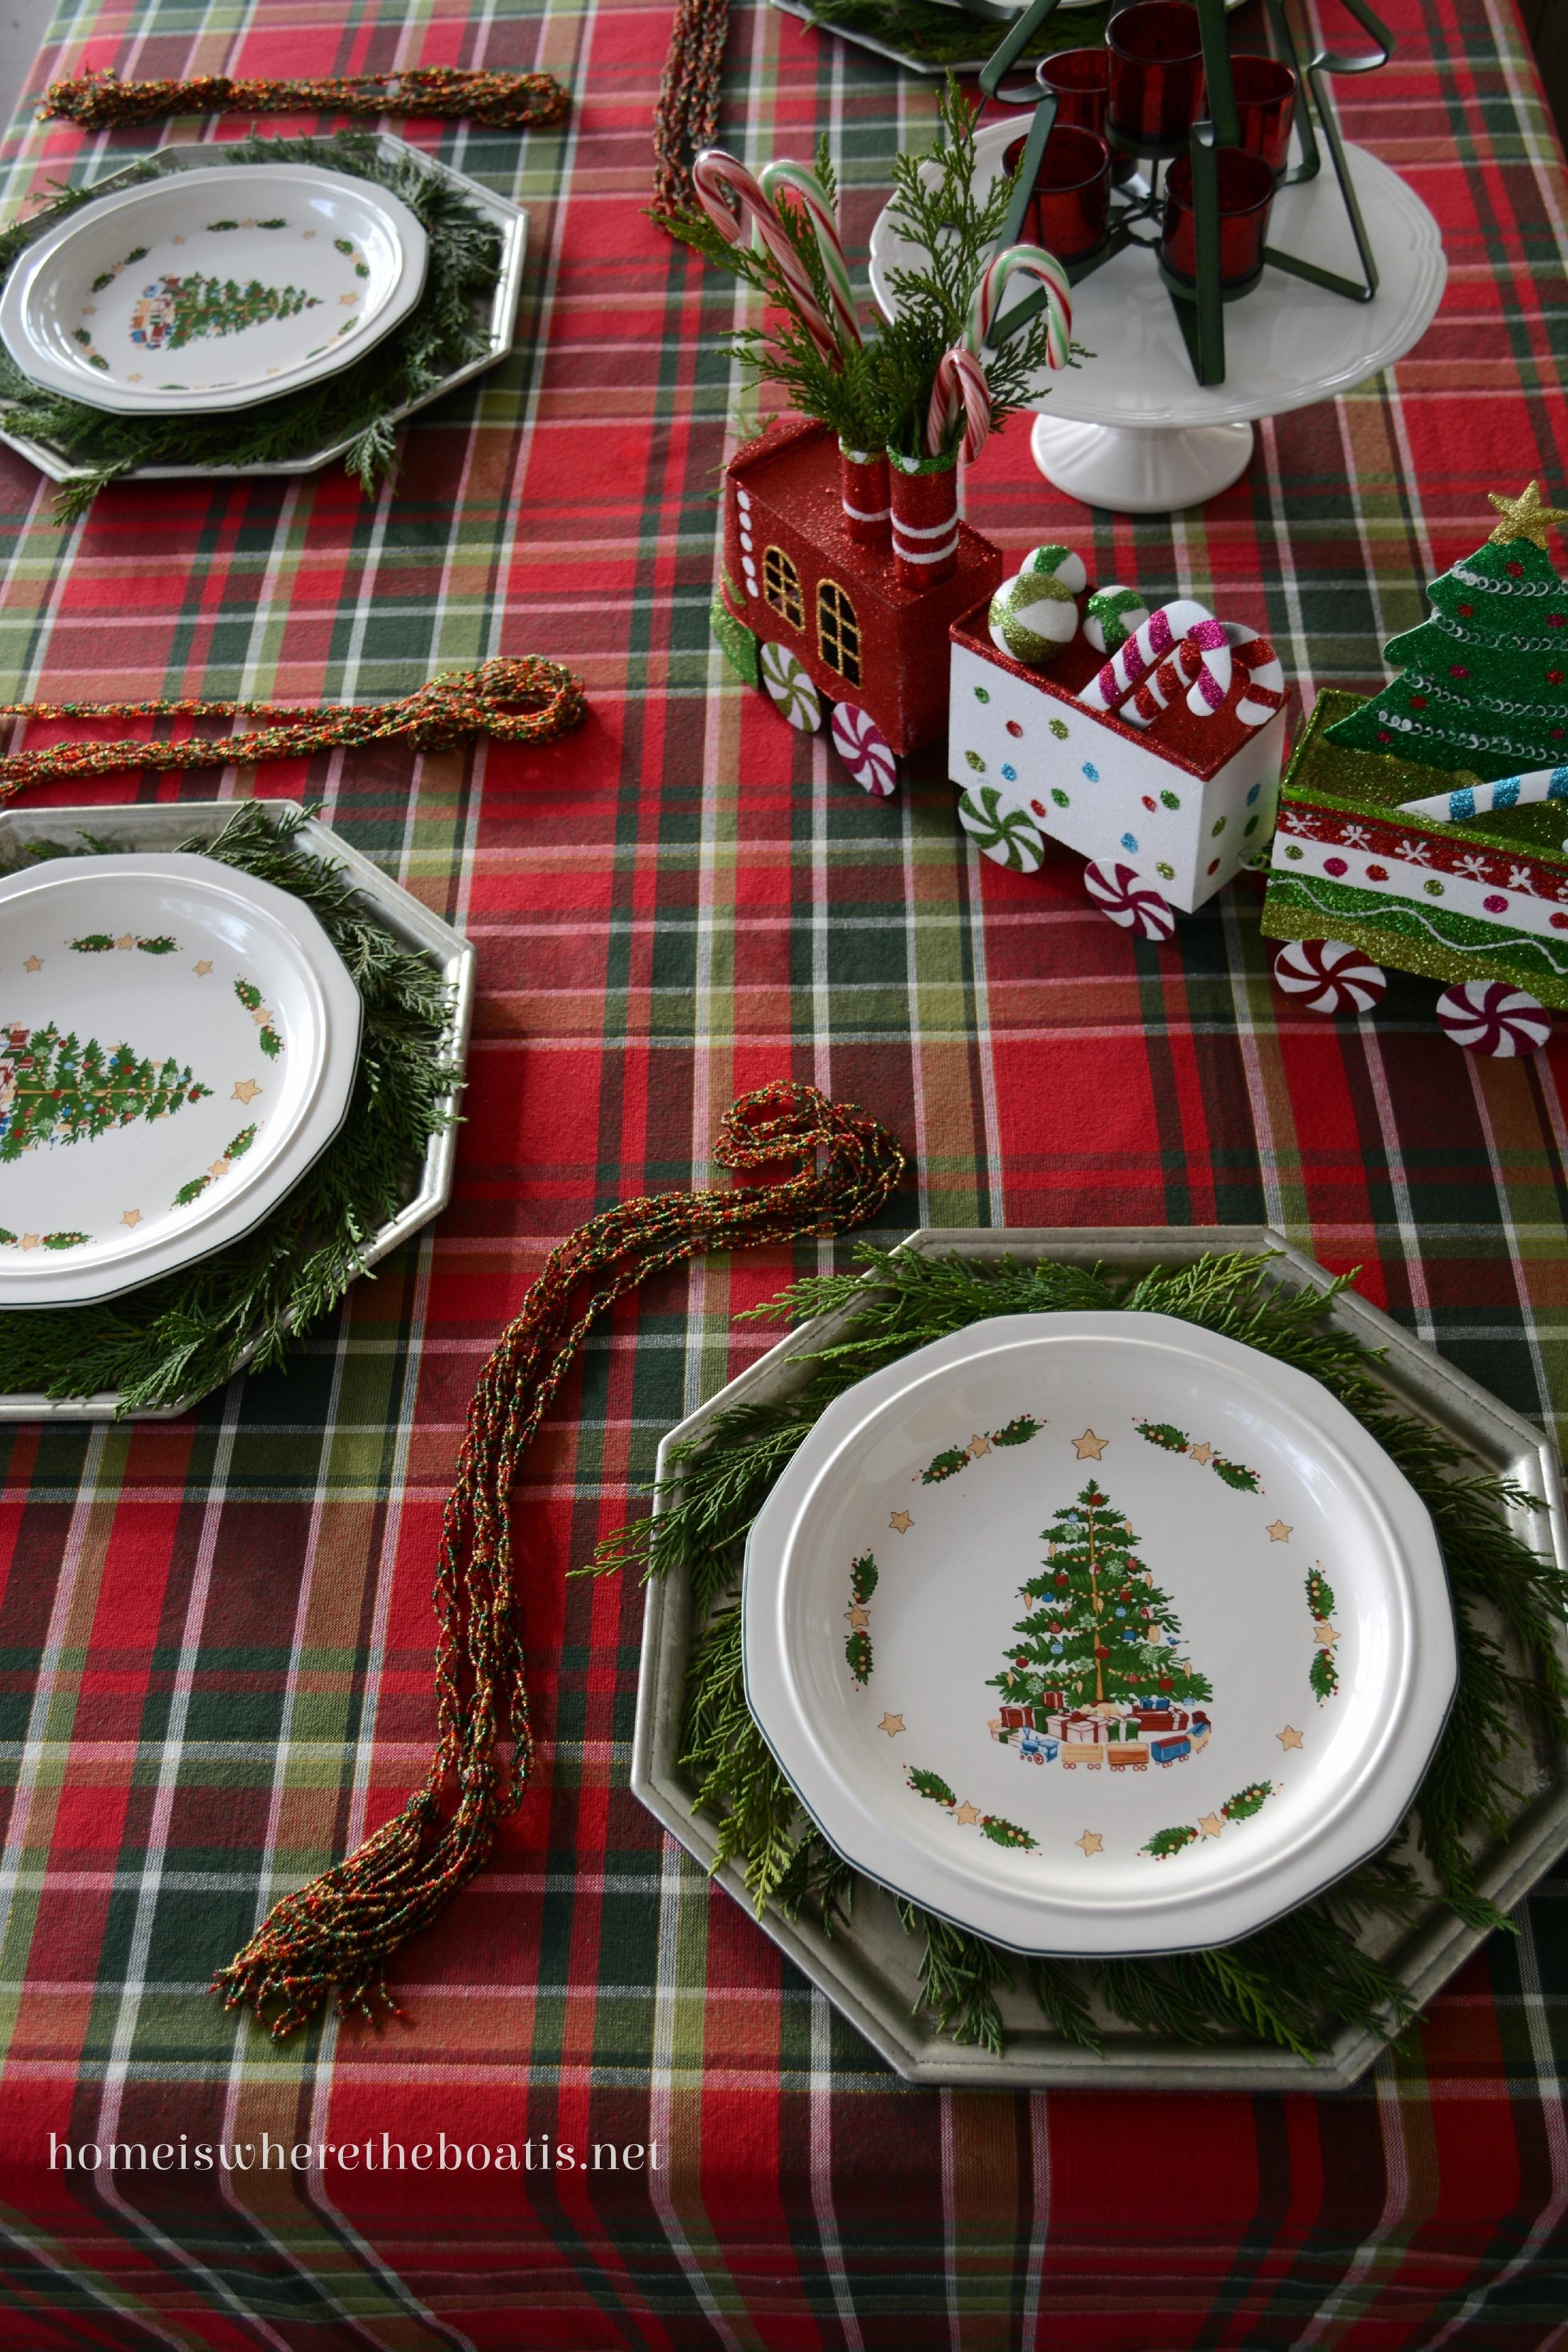 Christmas Cheer: Trains, Candy Canes, Plaid and Pfaltzgraff ...